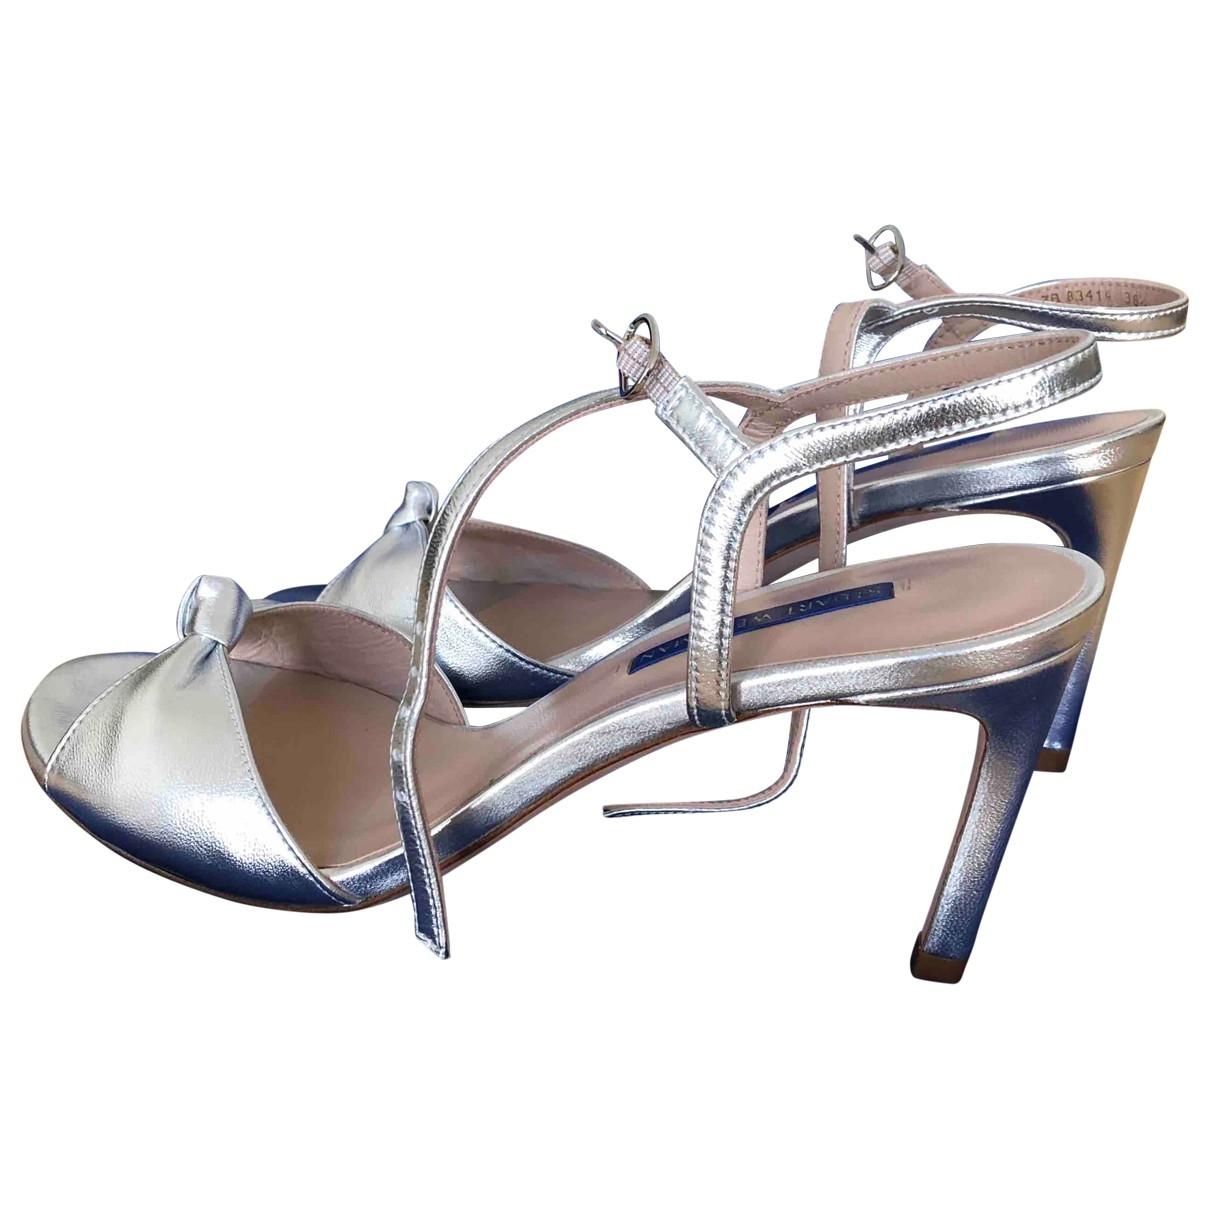 Stuart Weitzman \N Silver Leather Sandals for Women 38.5 EU